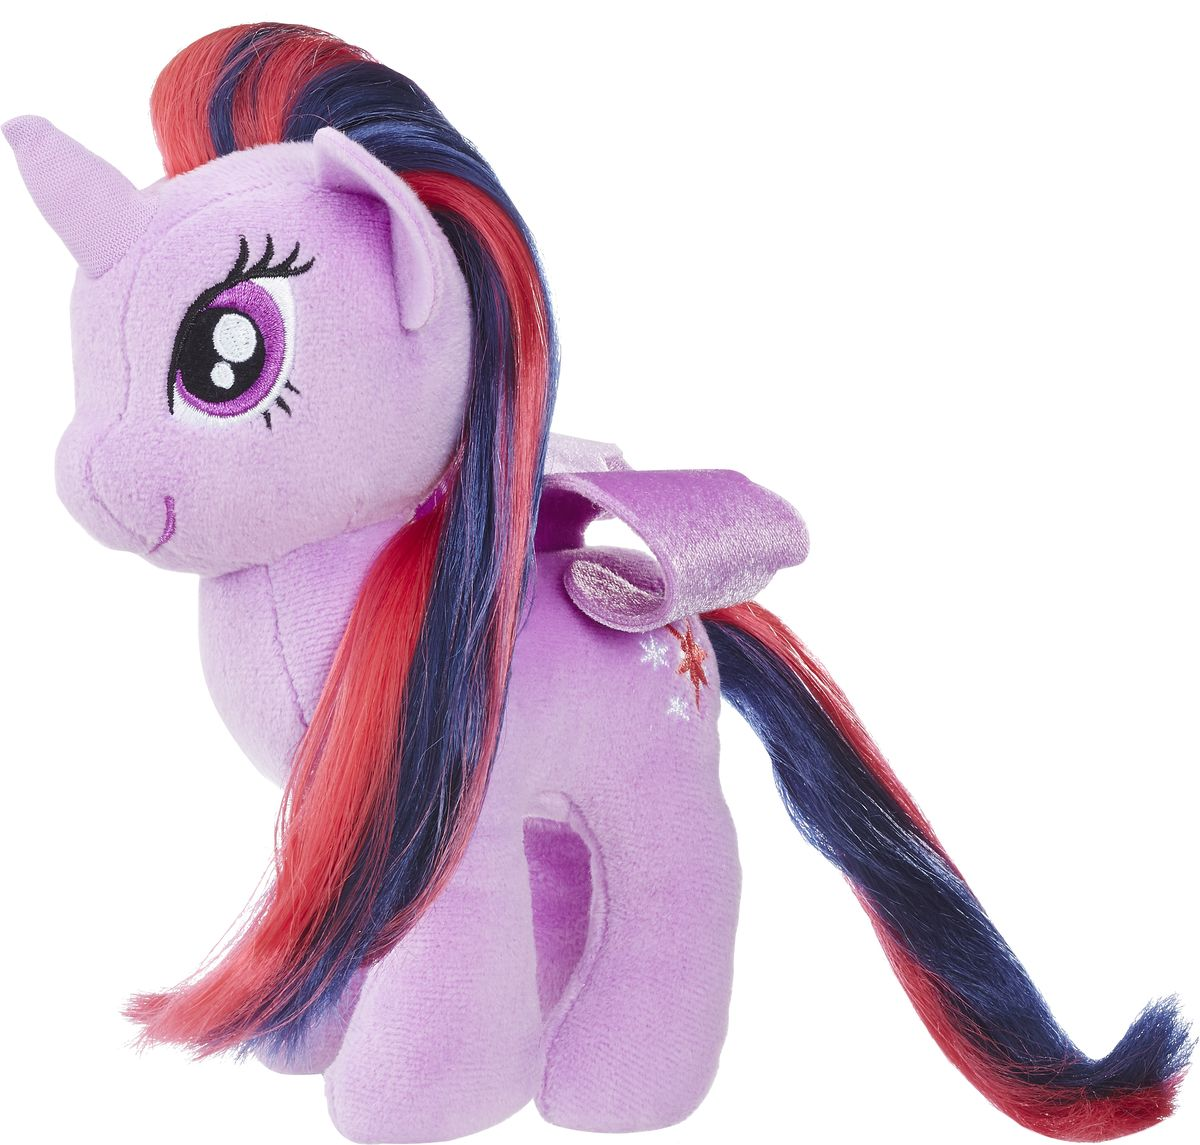 My Little Pony Мягкая игрушка Пони с волосами Twilight Sparkle 19 см детство лидера